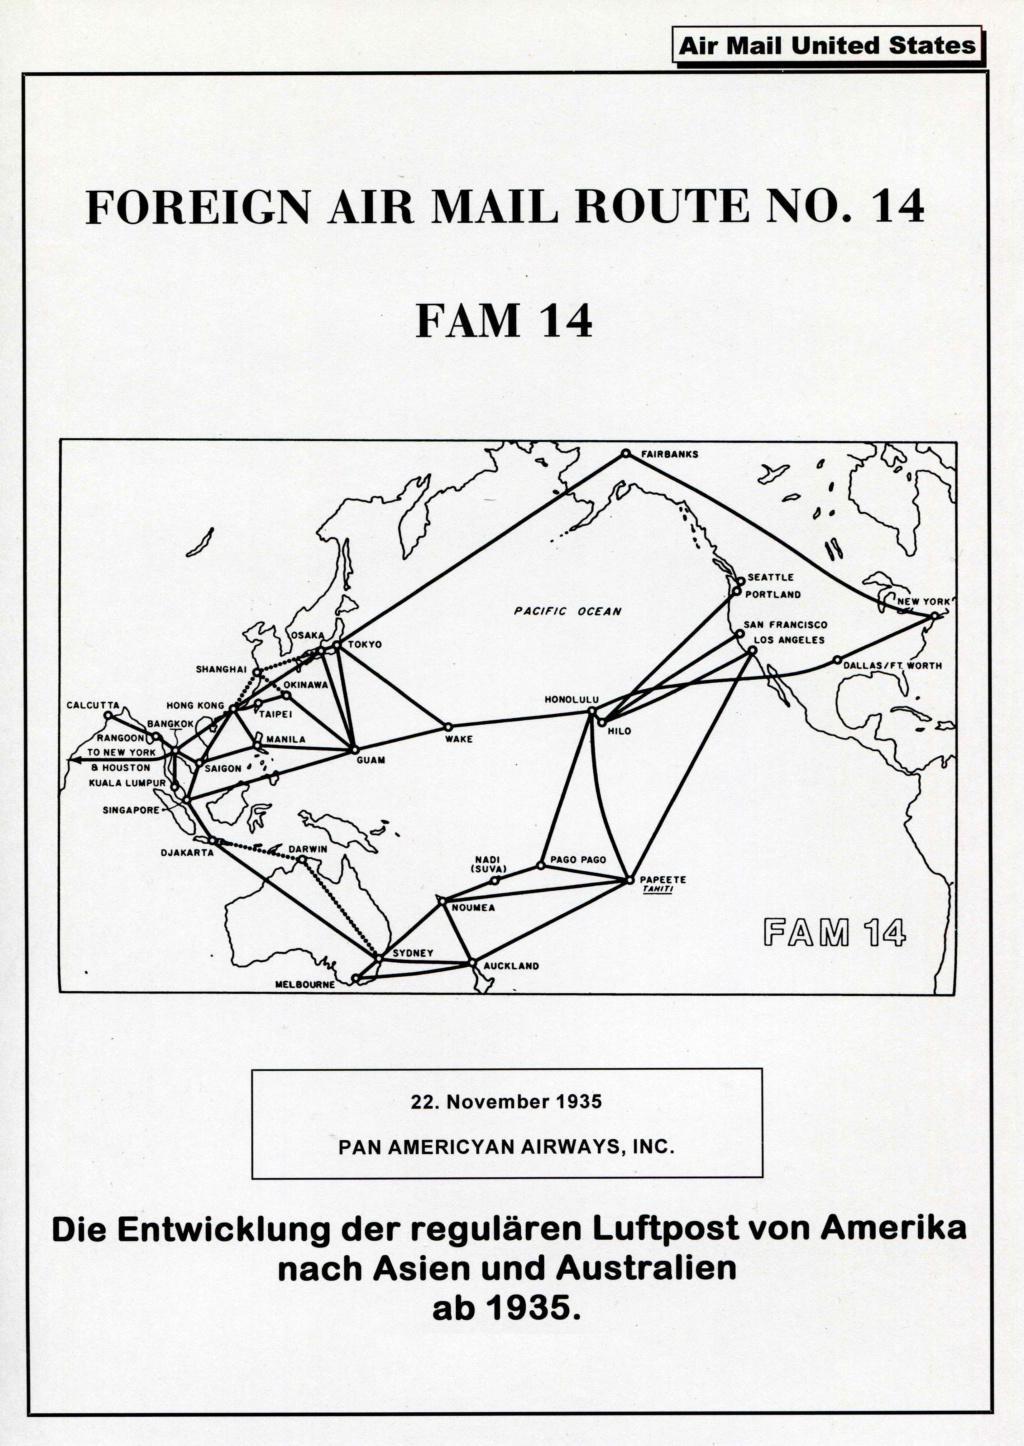 Sammlung FAM 14 (FOREIGN AIR MAIL ROUTE No 14) - Teil 1 Fam_1419